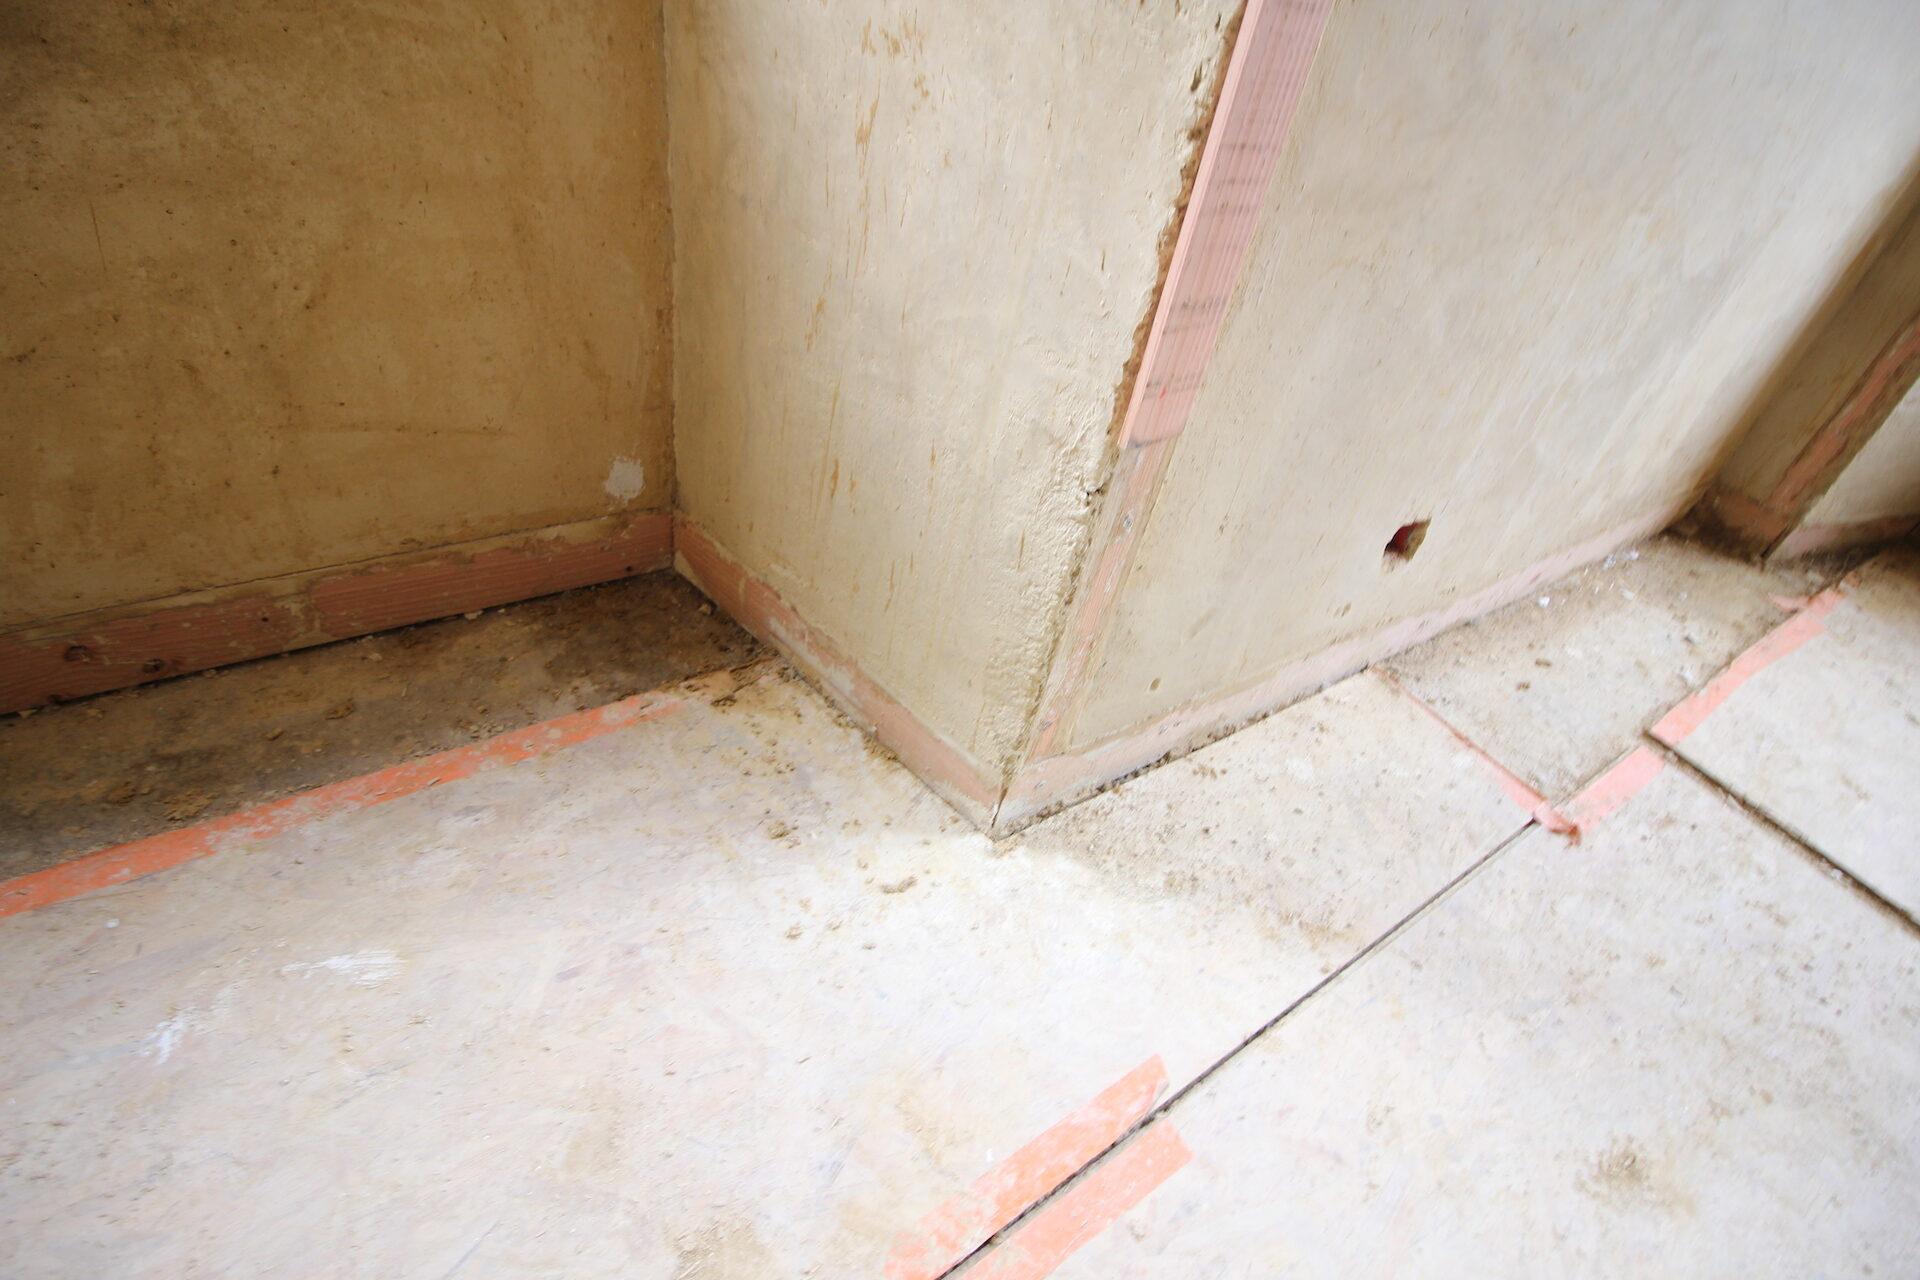 CSDK Lissage de murs en terre Bretagne 3 1920x1280 - Engagement durable - CSDK Lissage de murs en terre Bretagne 3 1920x1280